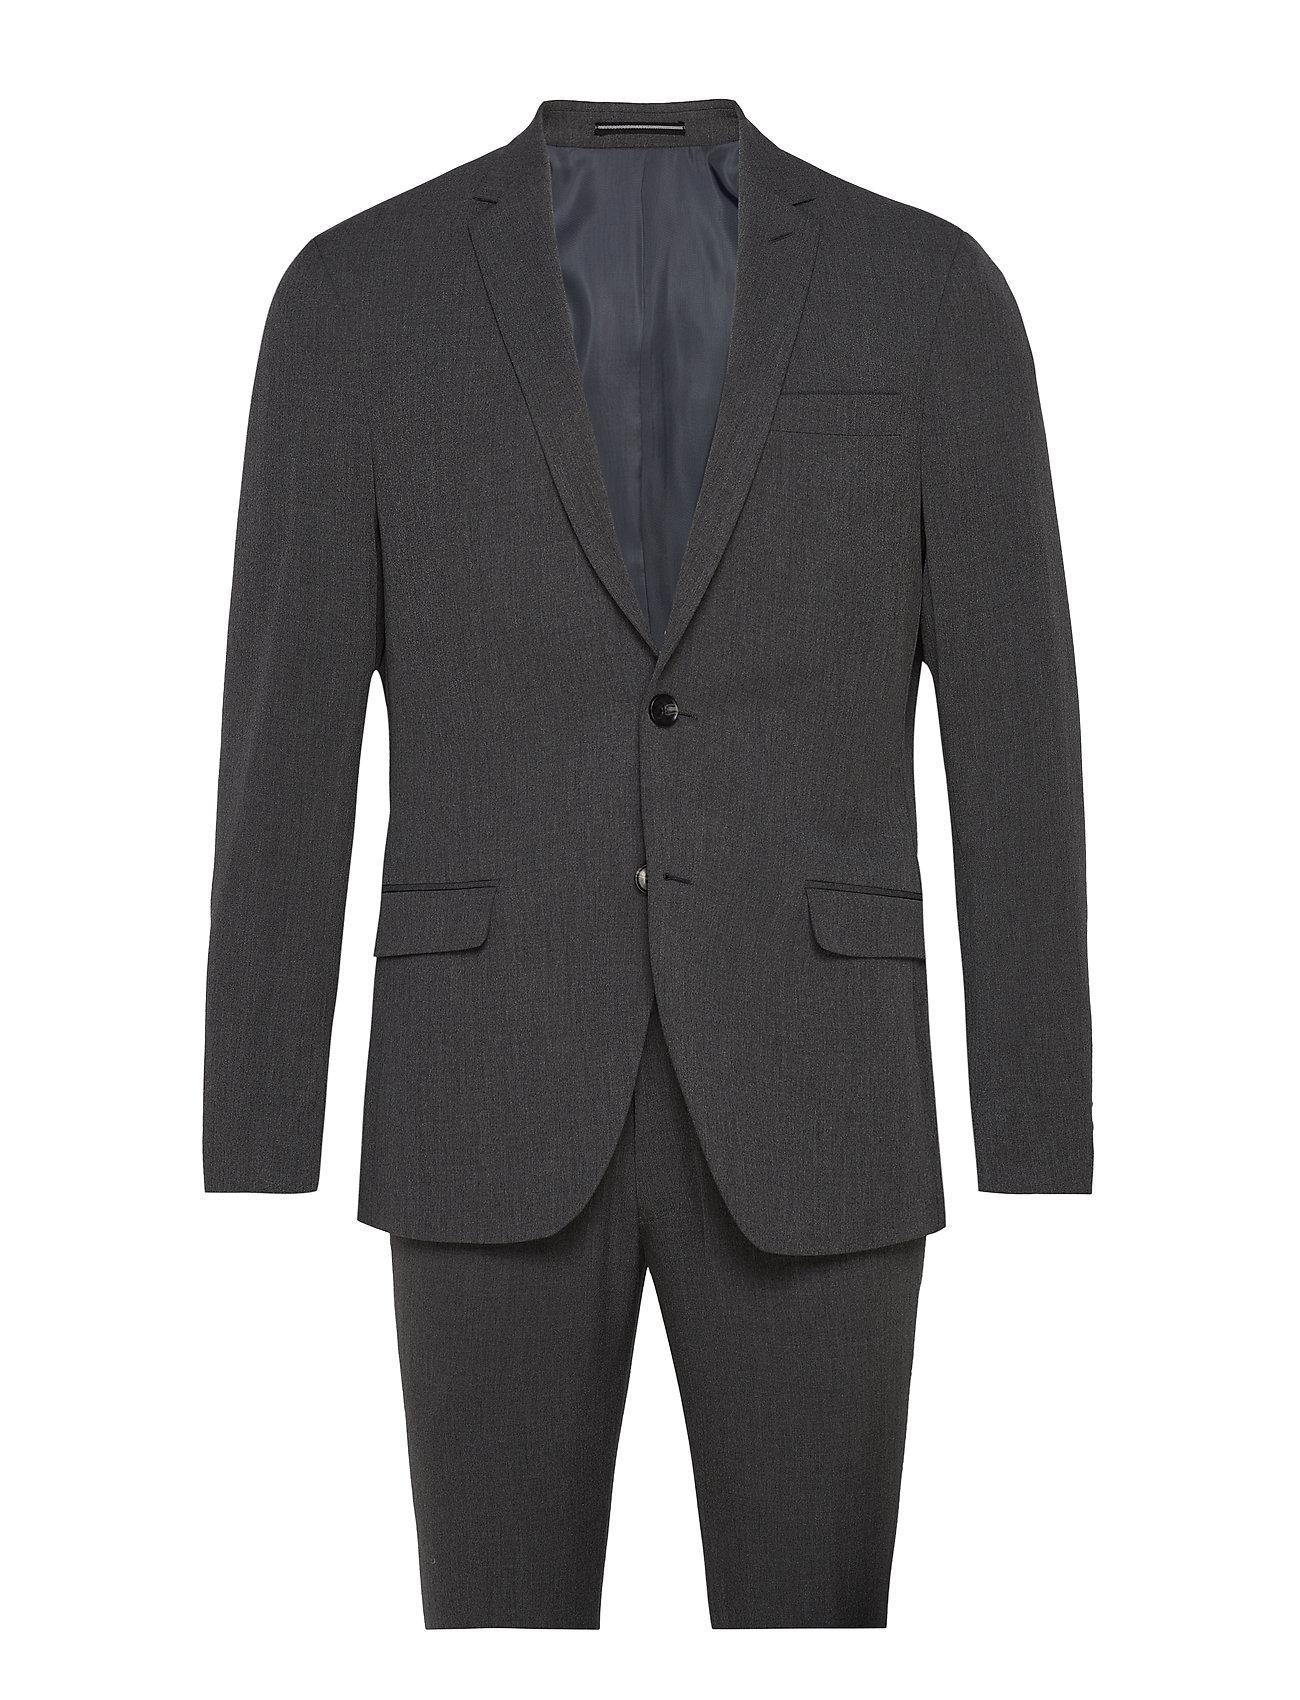 Bertoni Suit Andersen-Jepsen - 968 SLATE